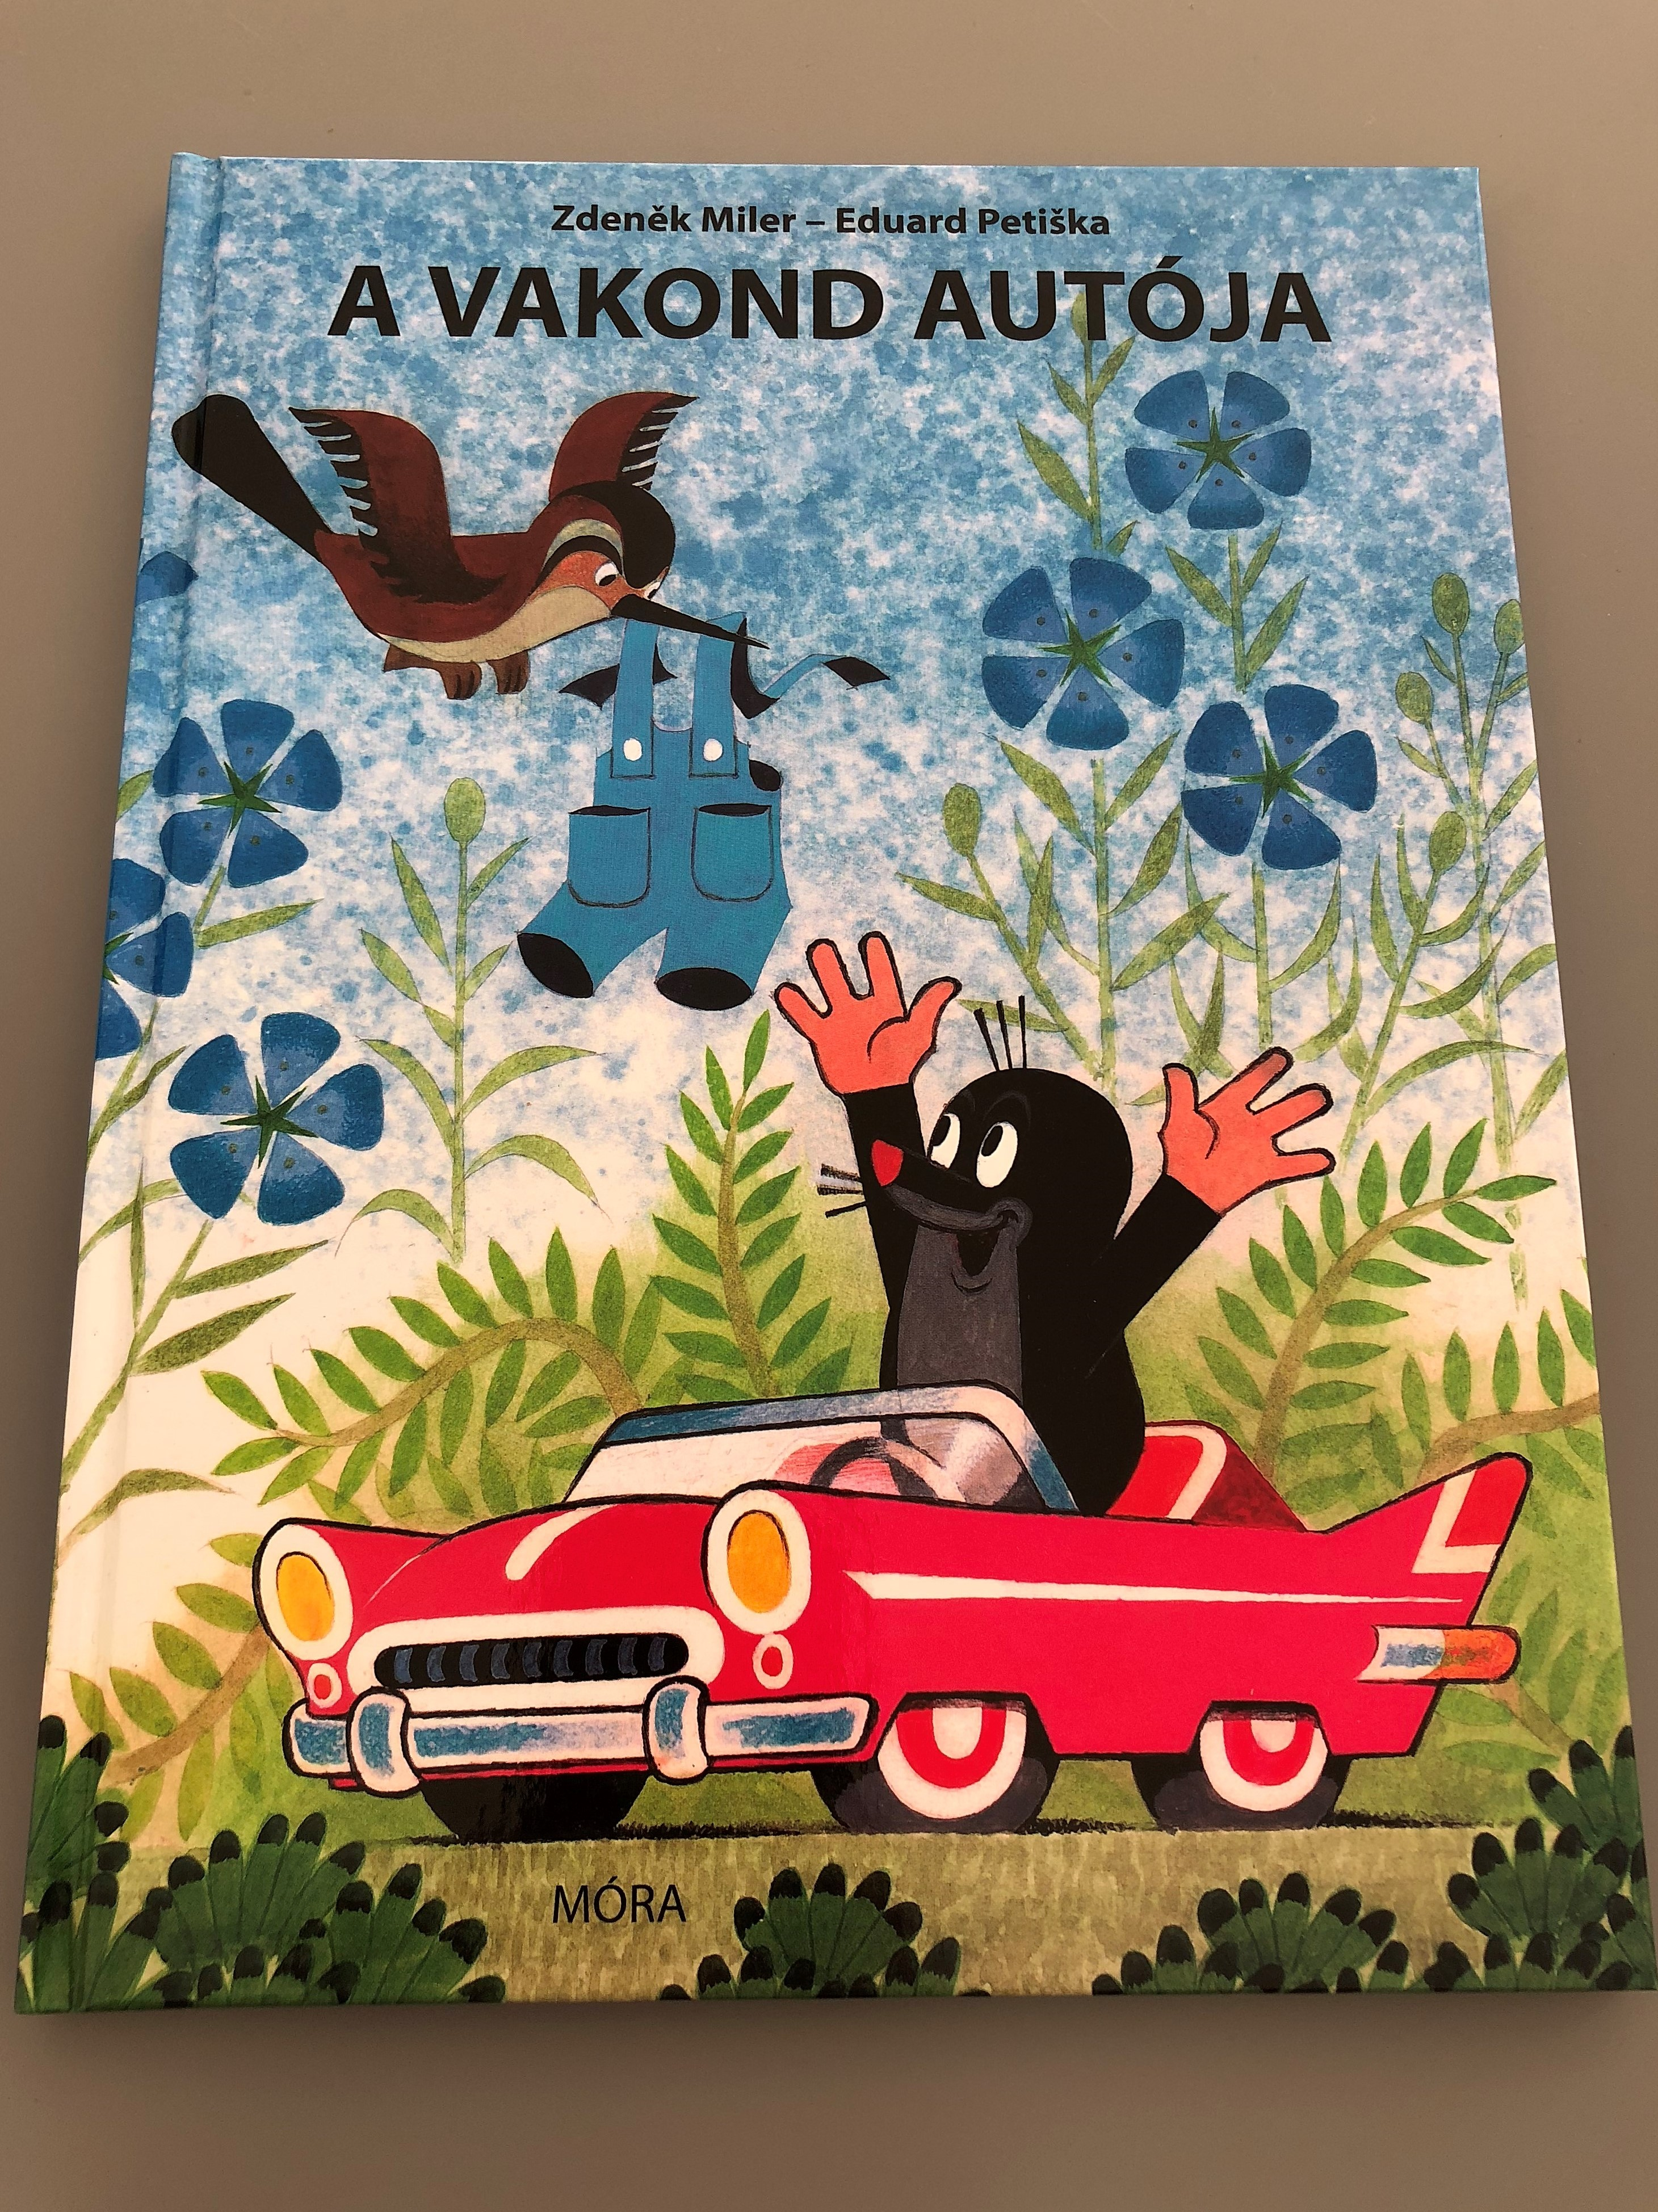 a-kisvakond-aut-ja-by-zdenek-miler-eduard-peti-ka-hungarian-translation-of-krtek-a-auti-ko-mesek-nyv-m-ra-k-nyvkiad-hardcover-1-.jpg